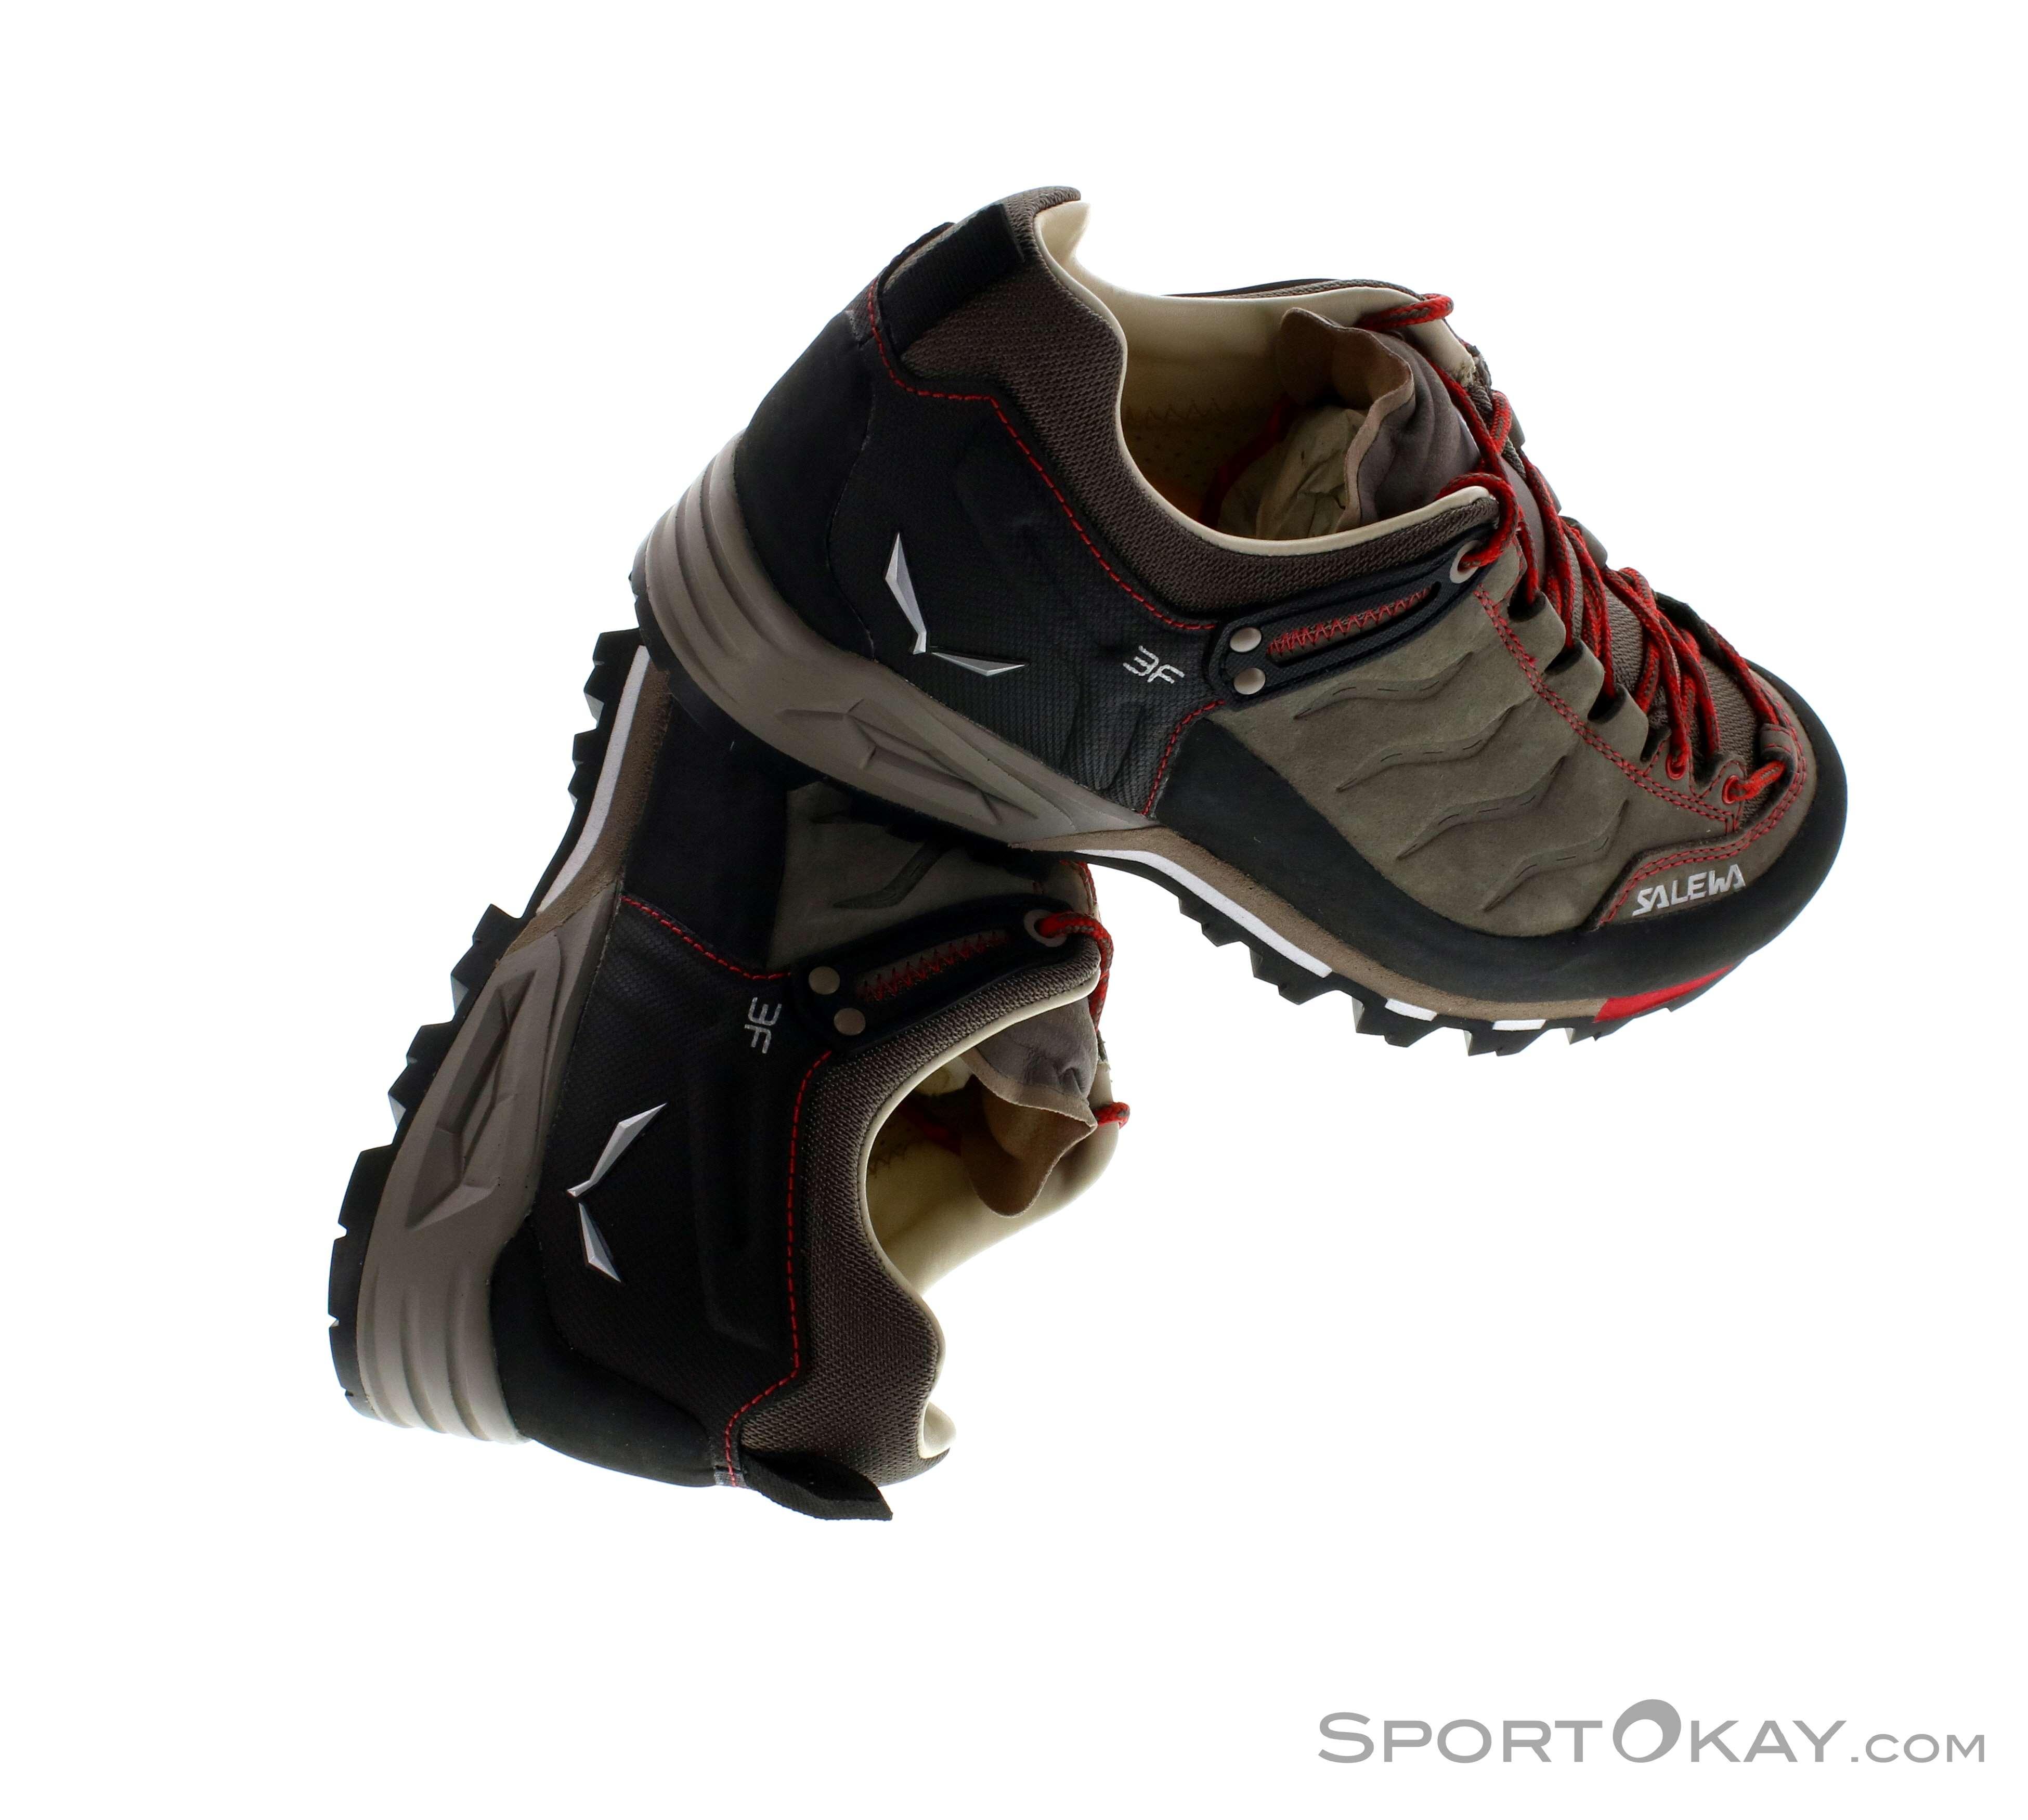 Salewa Salewa MS MTN Trainer L Mens Hiking Boots